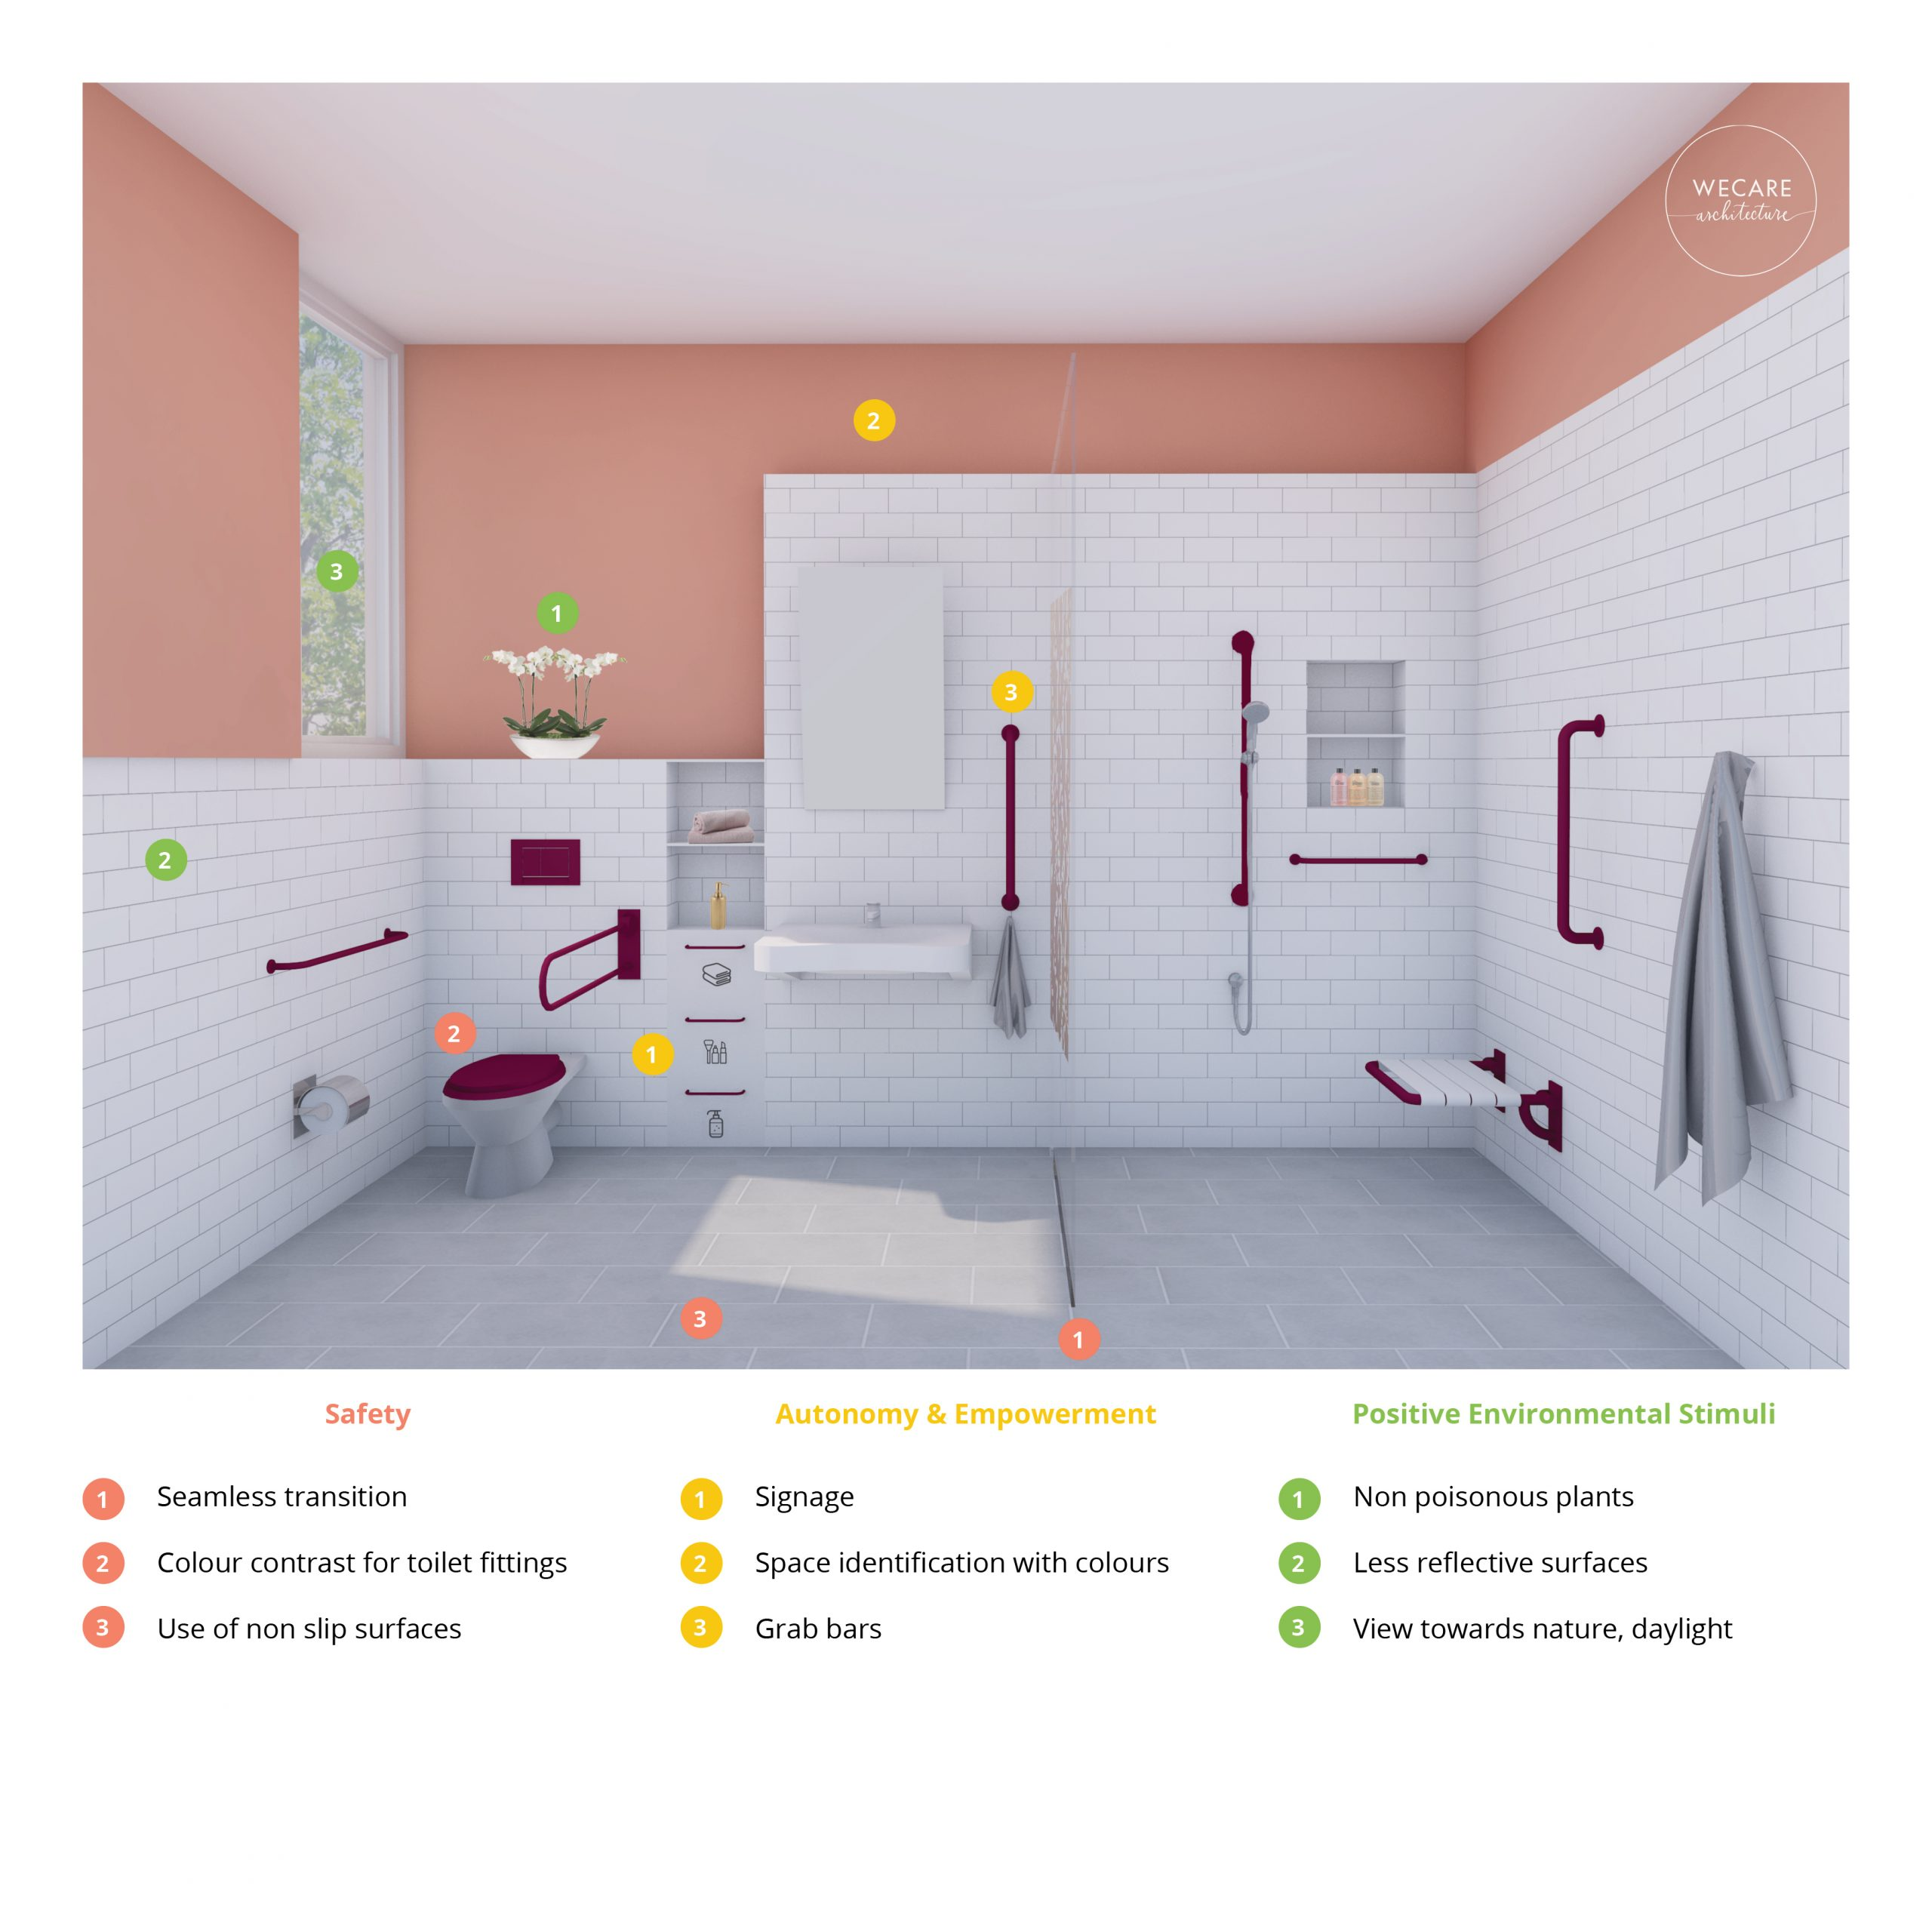 WeCare Dementia friendly environment bathroom